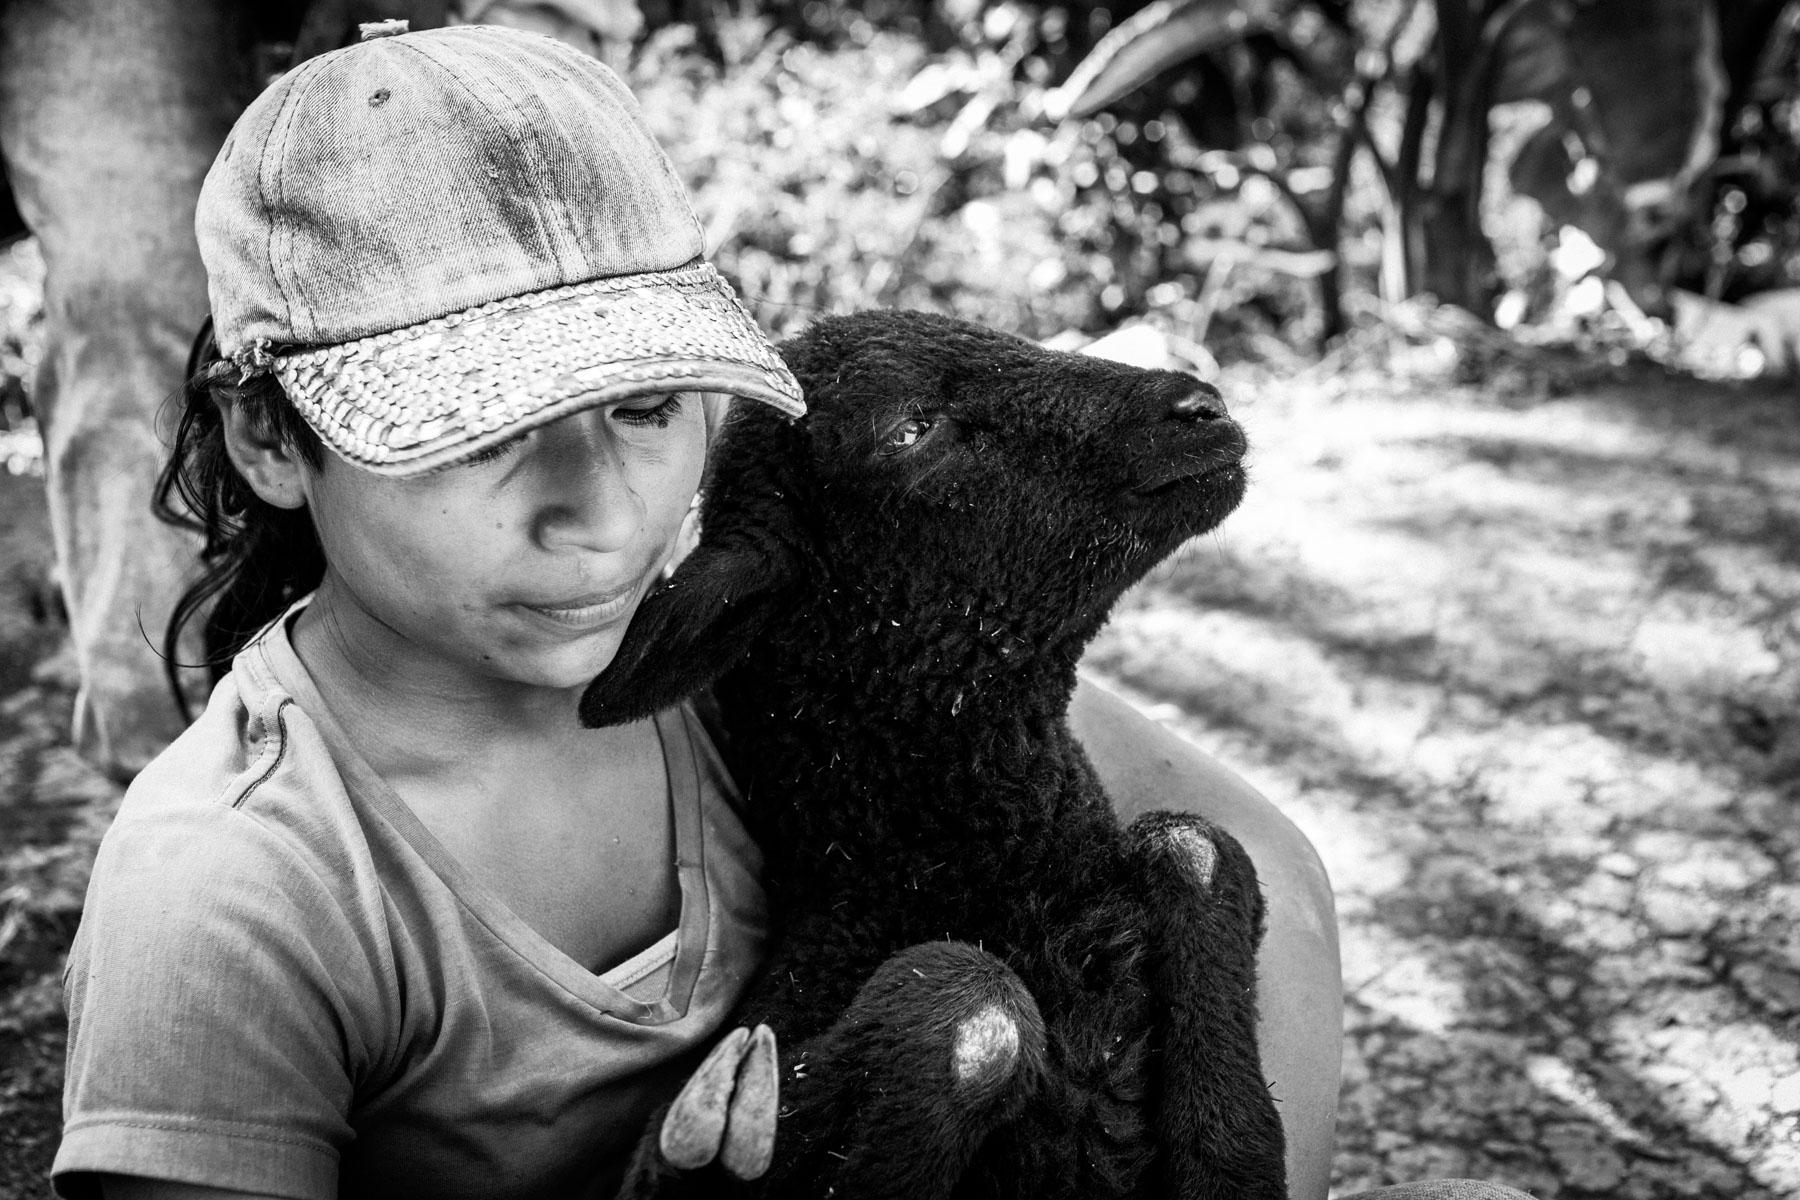 Karen Edith Baicue Pavi, La Betulia, Resguardo de San Francisco, Cauca, Colombia, Agosto 16, 2018.